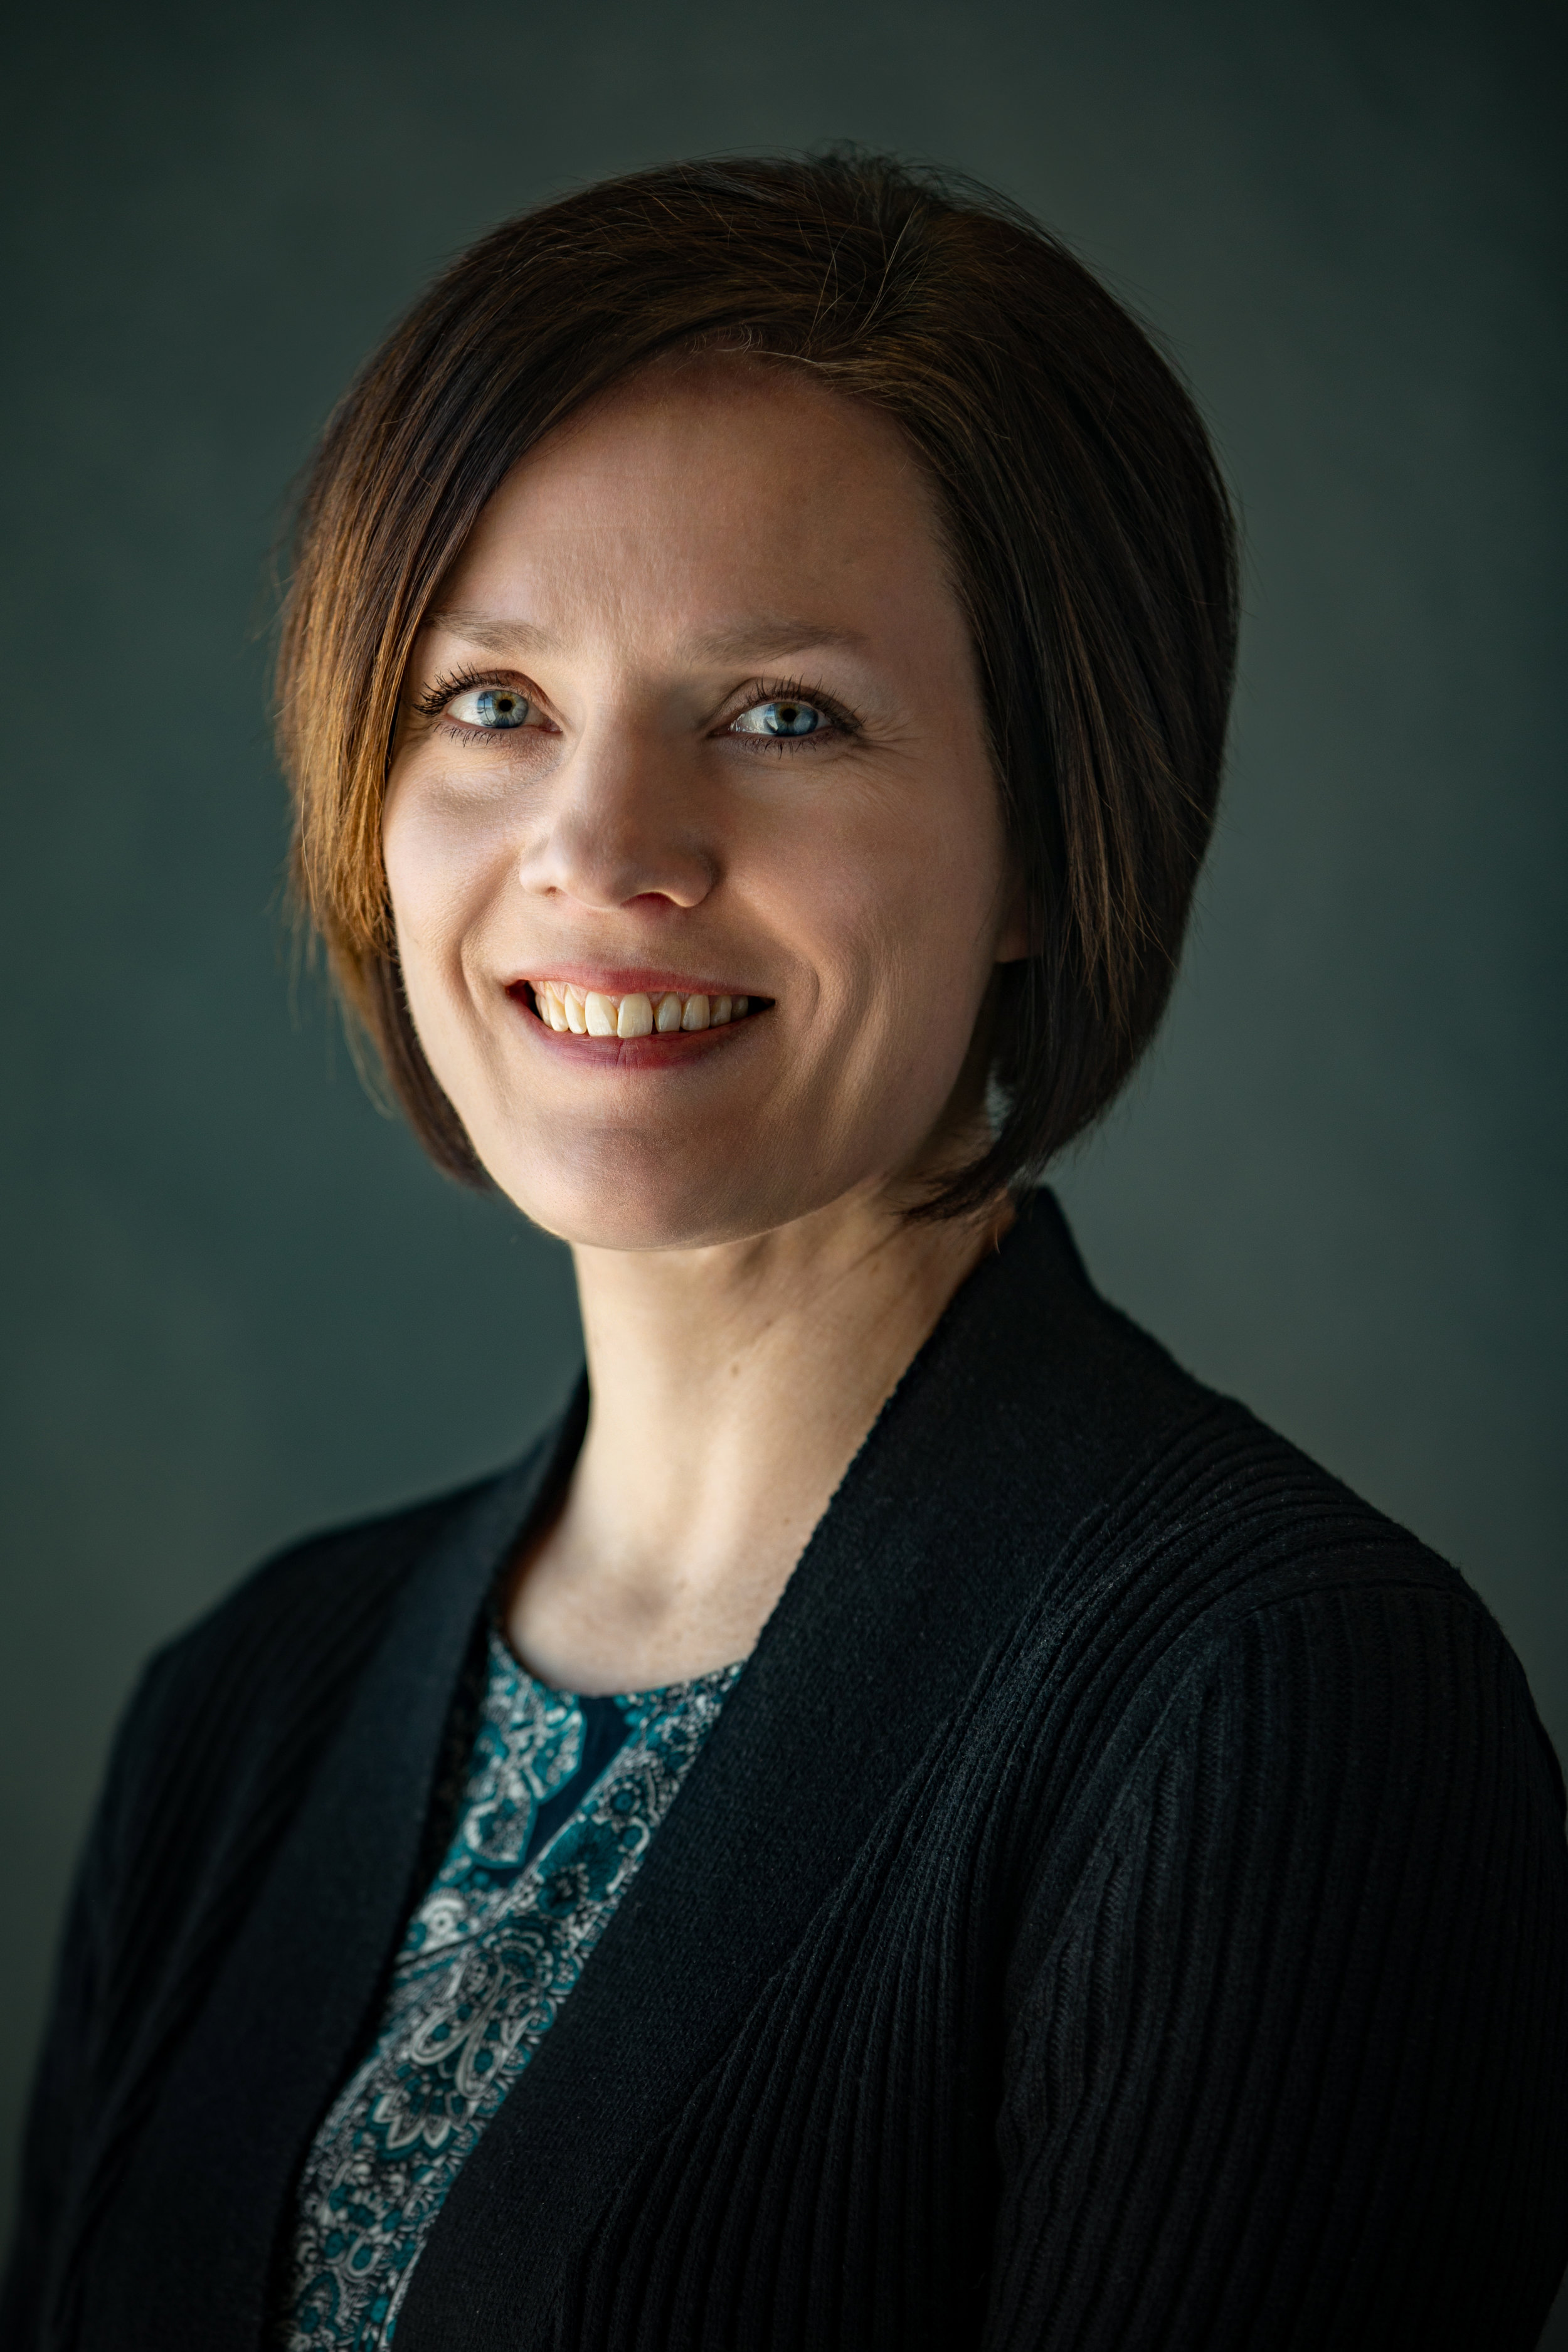 Aimee Benoit, Curator